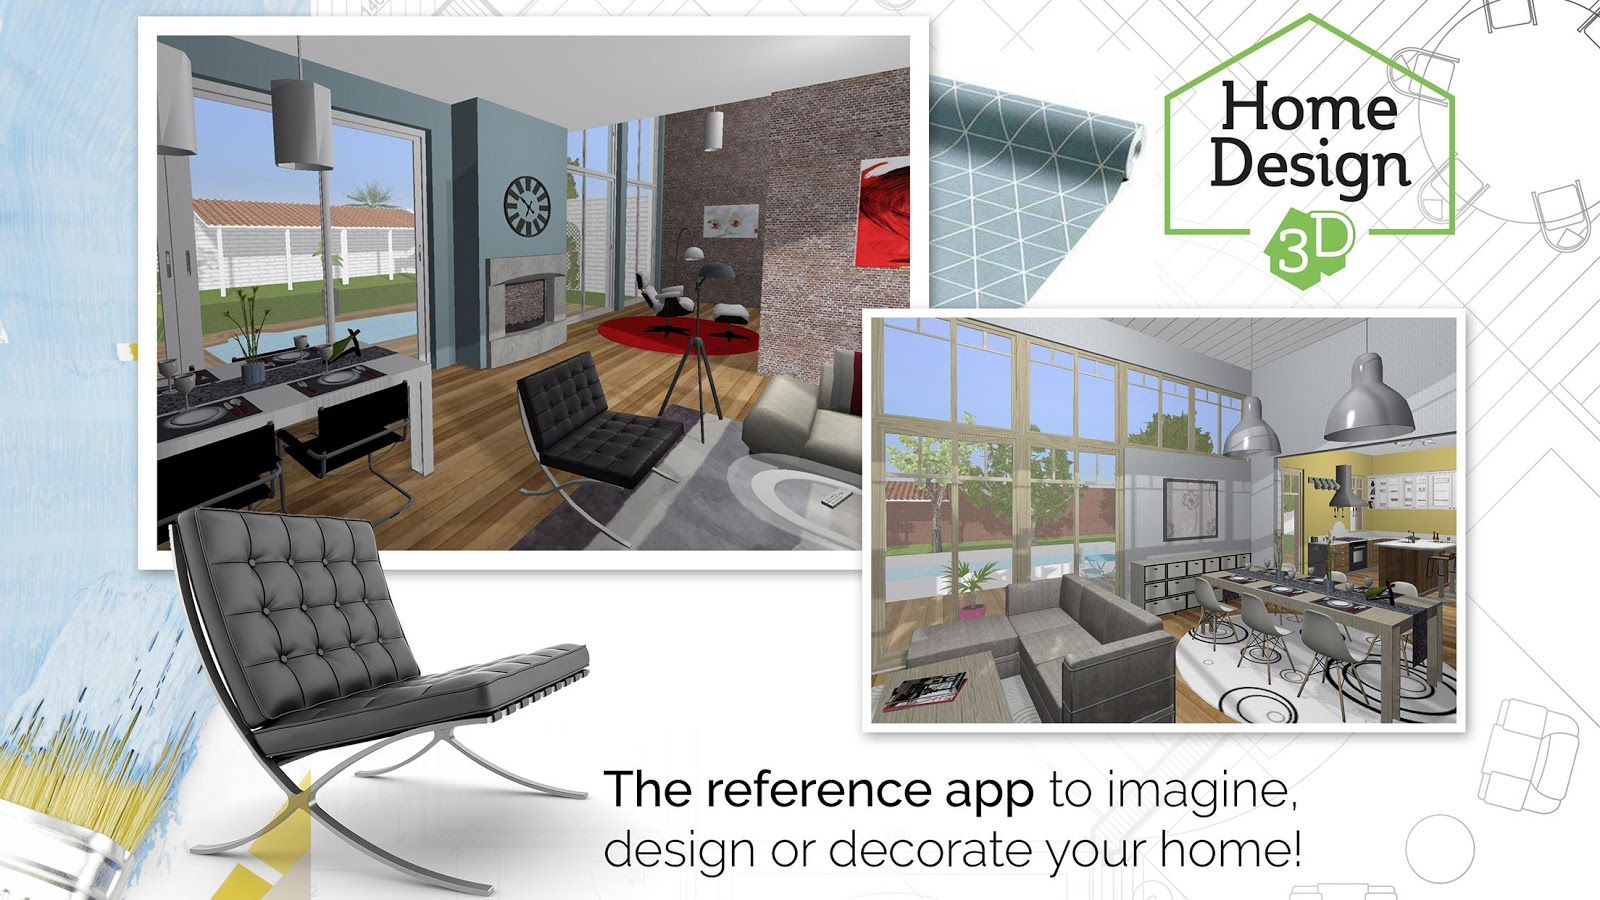 Home Design 3d Apk Mod V4 1 2 Unlock All Android Real Apk Mod